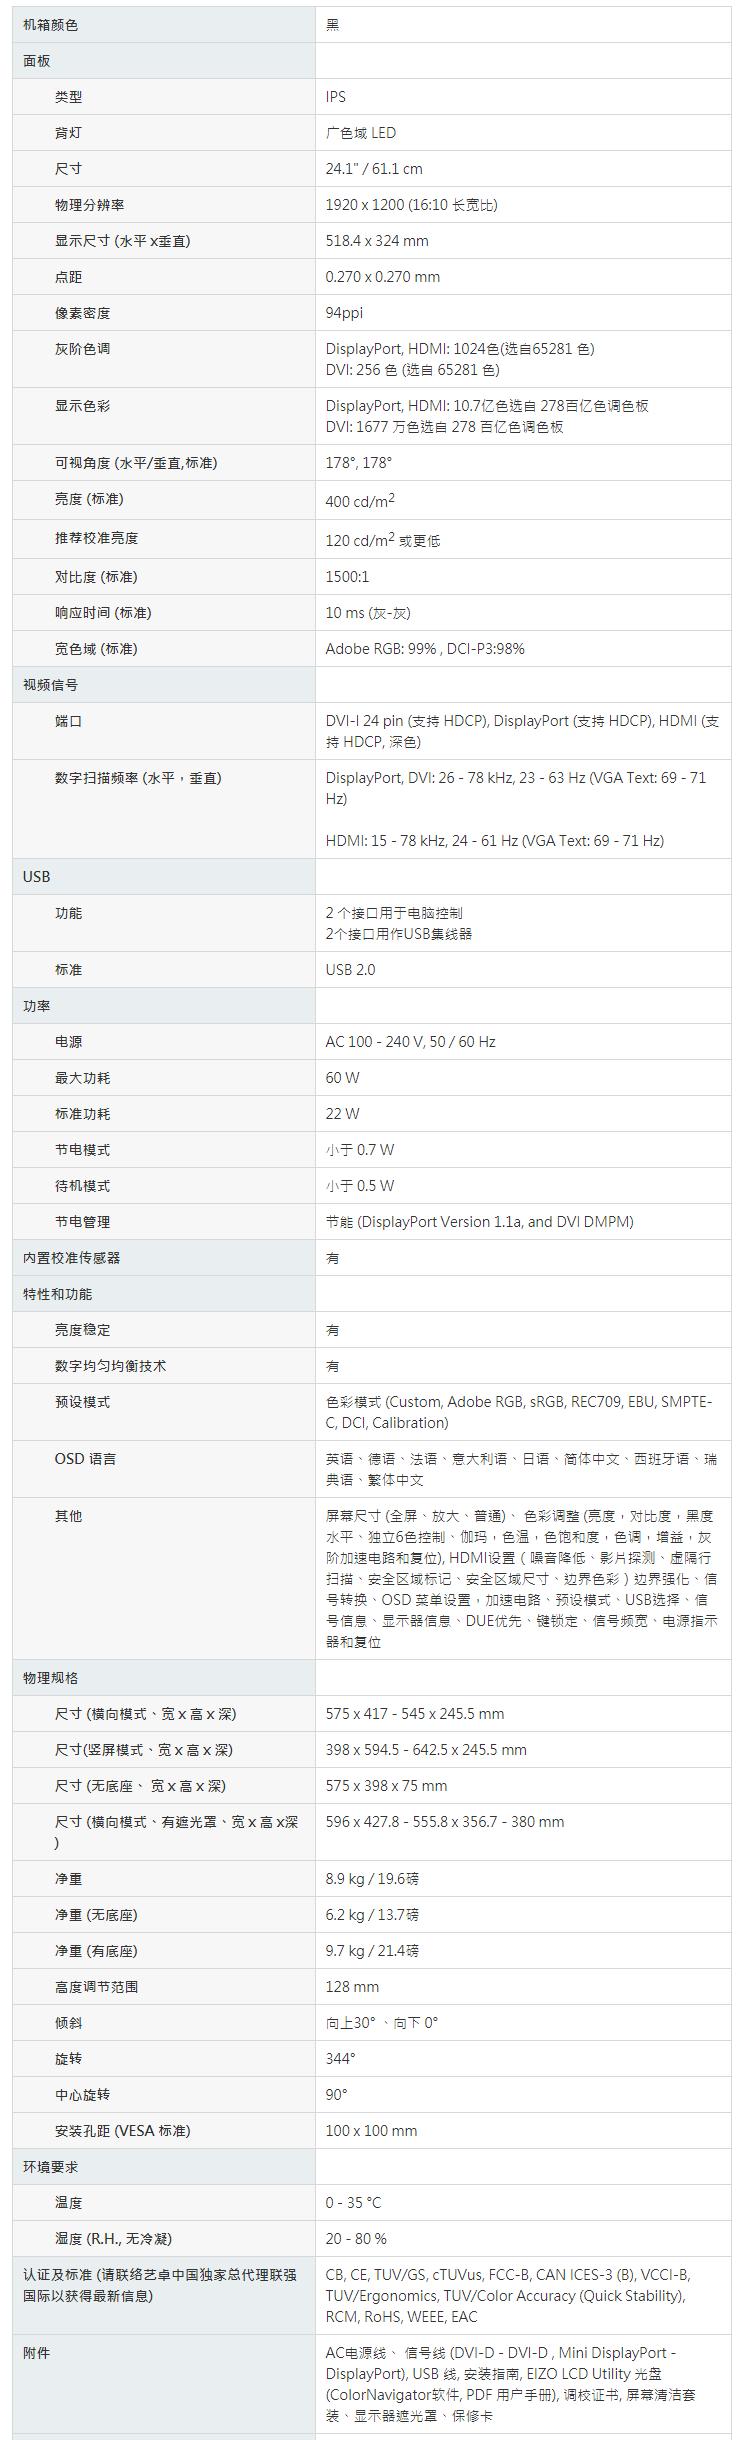 ColorEdge CG247X _ 艺卓